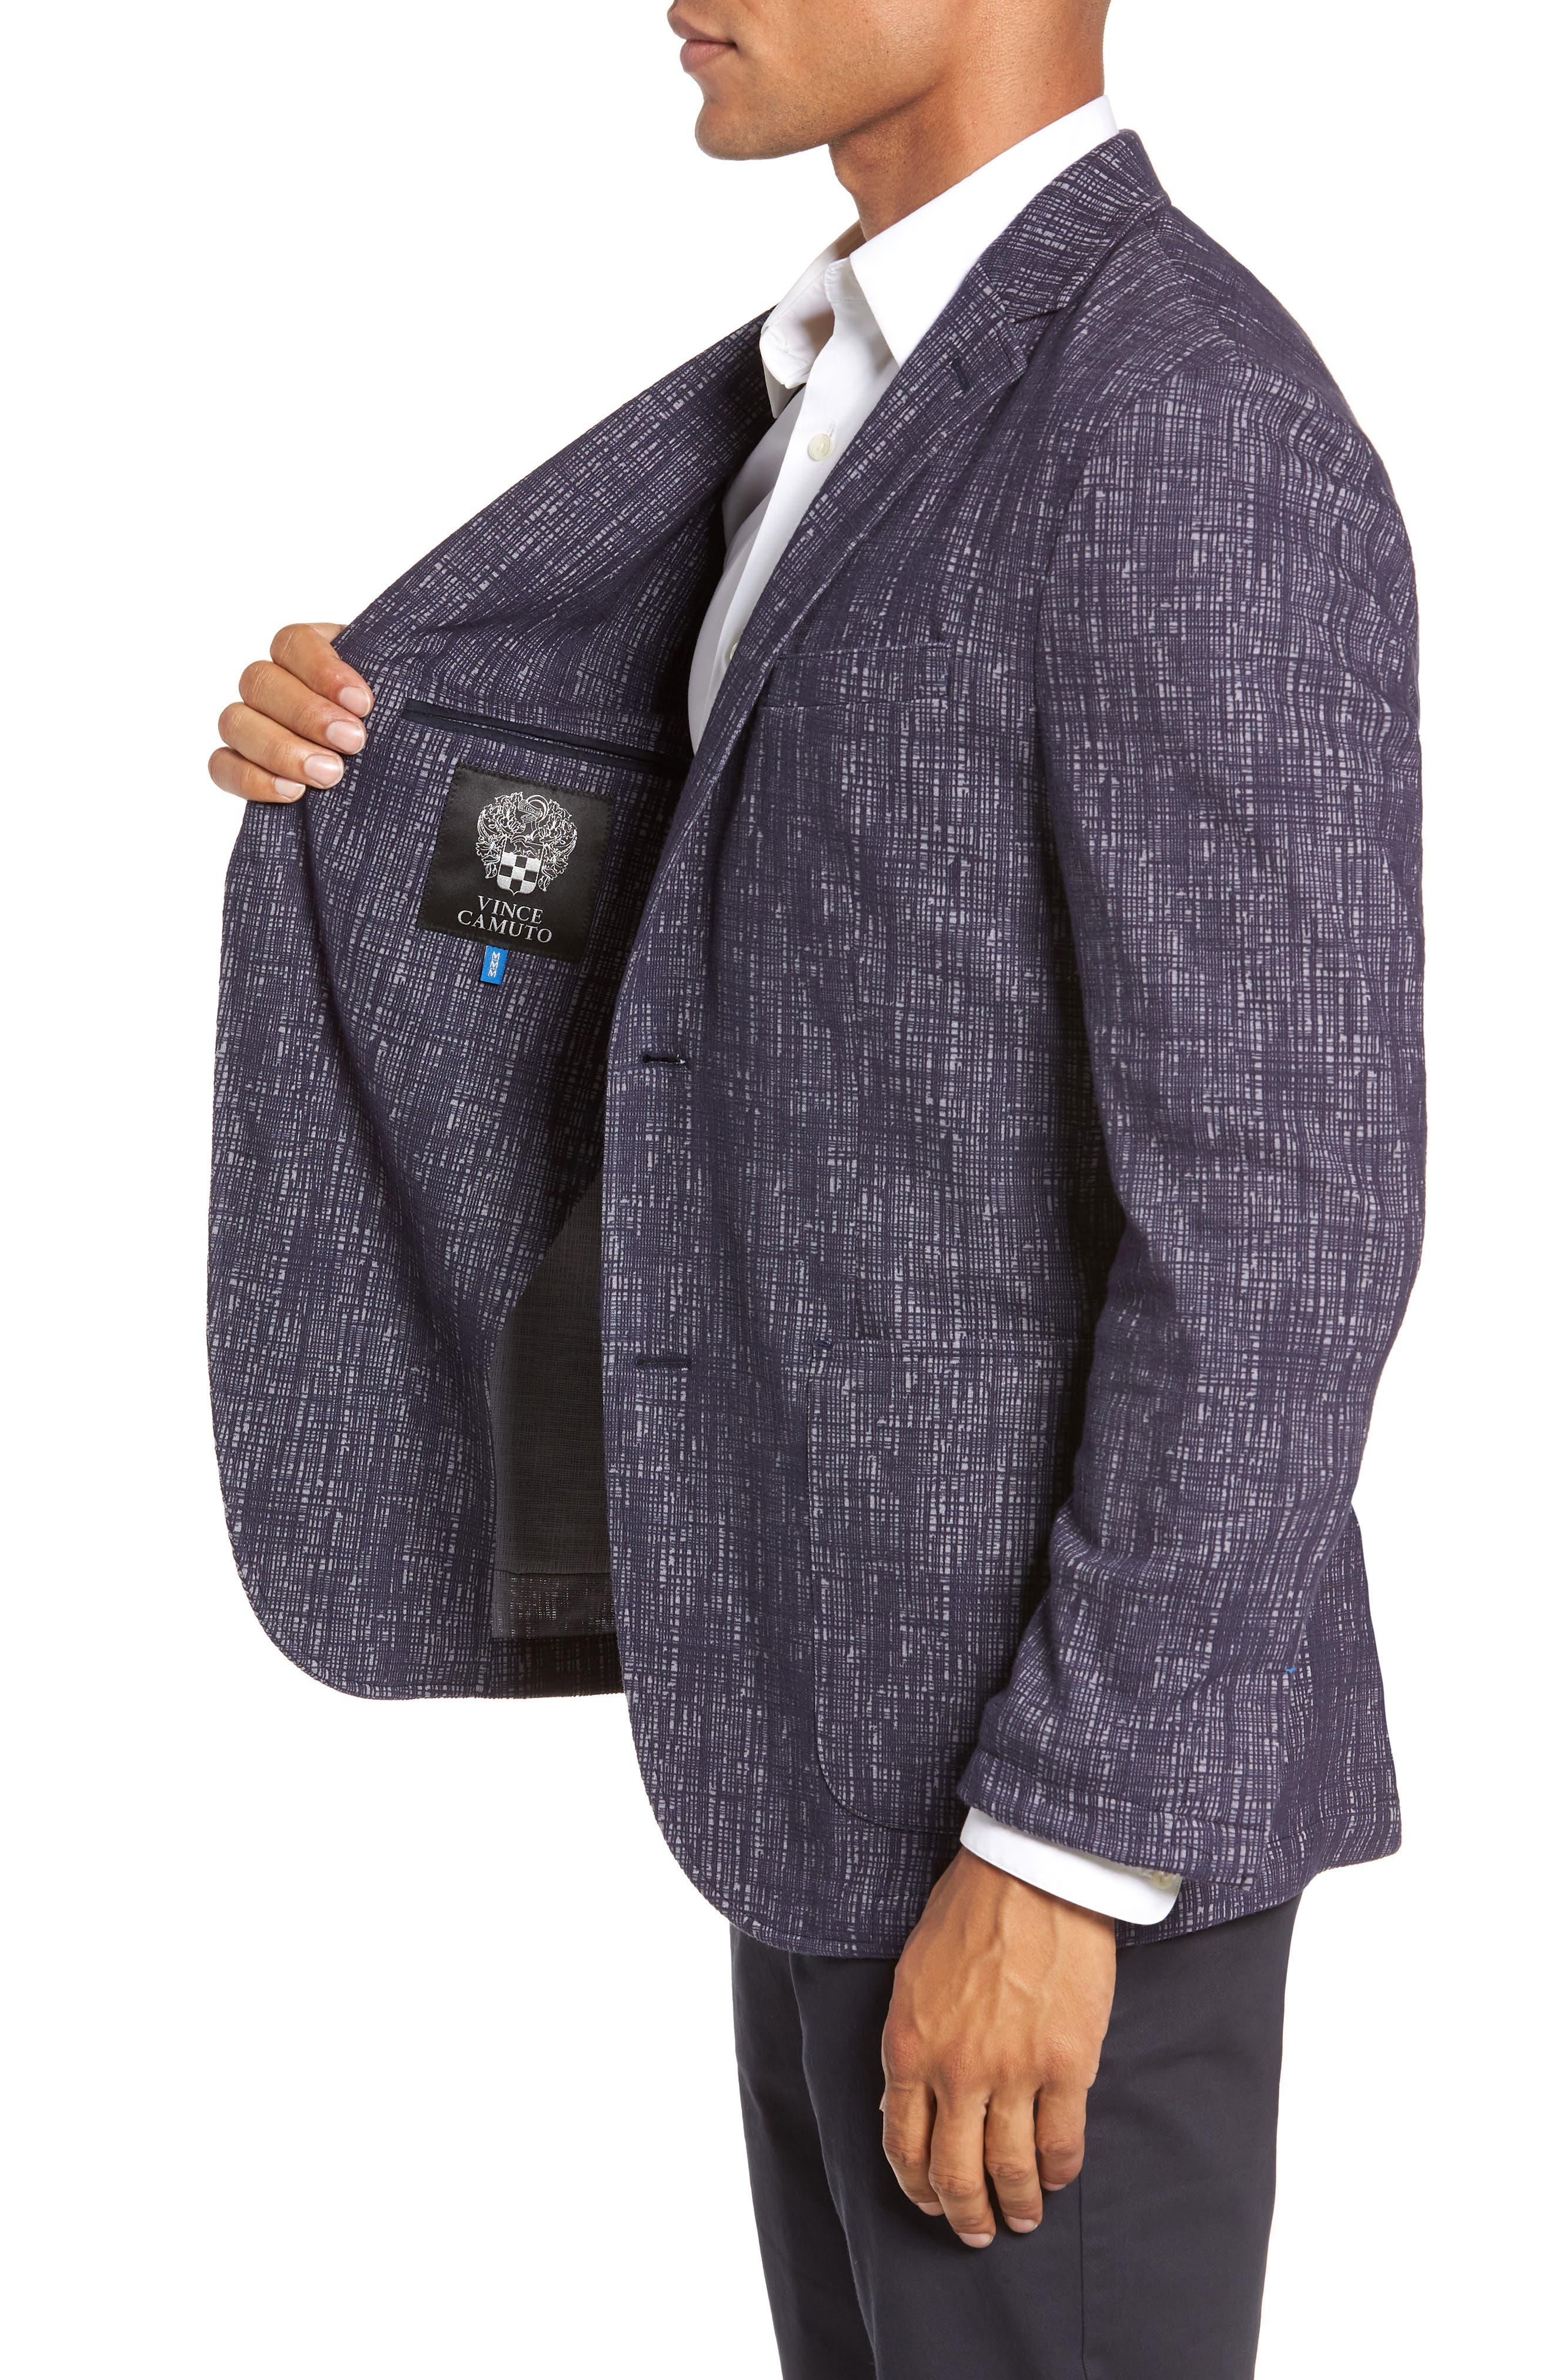 VINCE CAMUTO,                             Mesh Pattern Slim Fit Sport Coat,                             Alternate thumbnail 3, color,                             BLUE